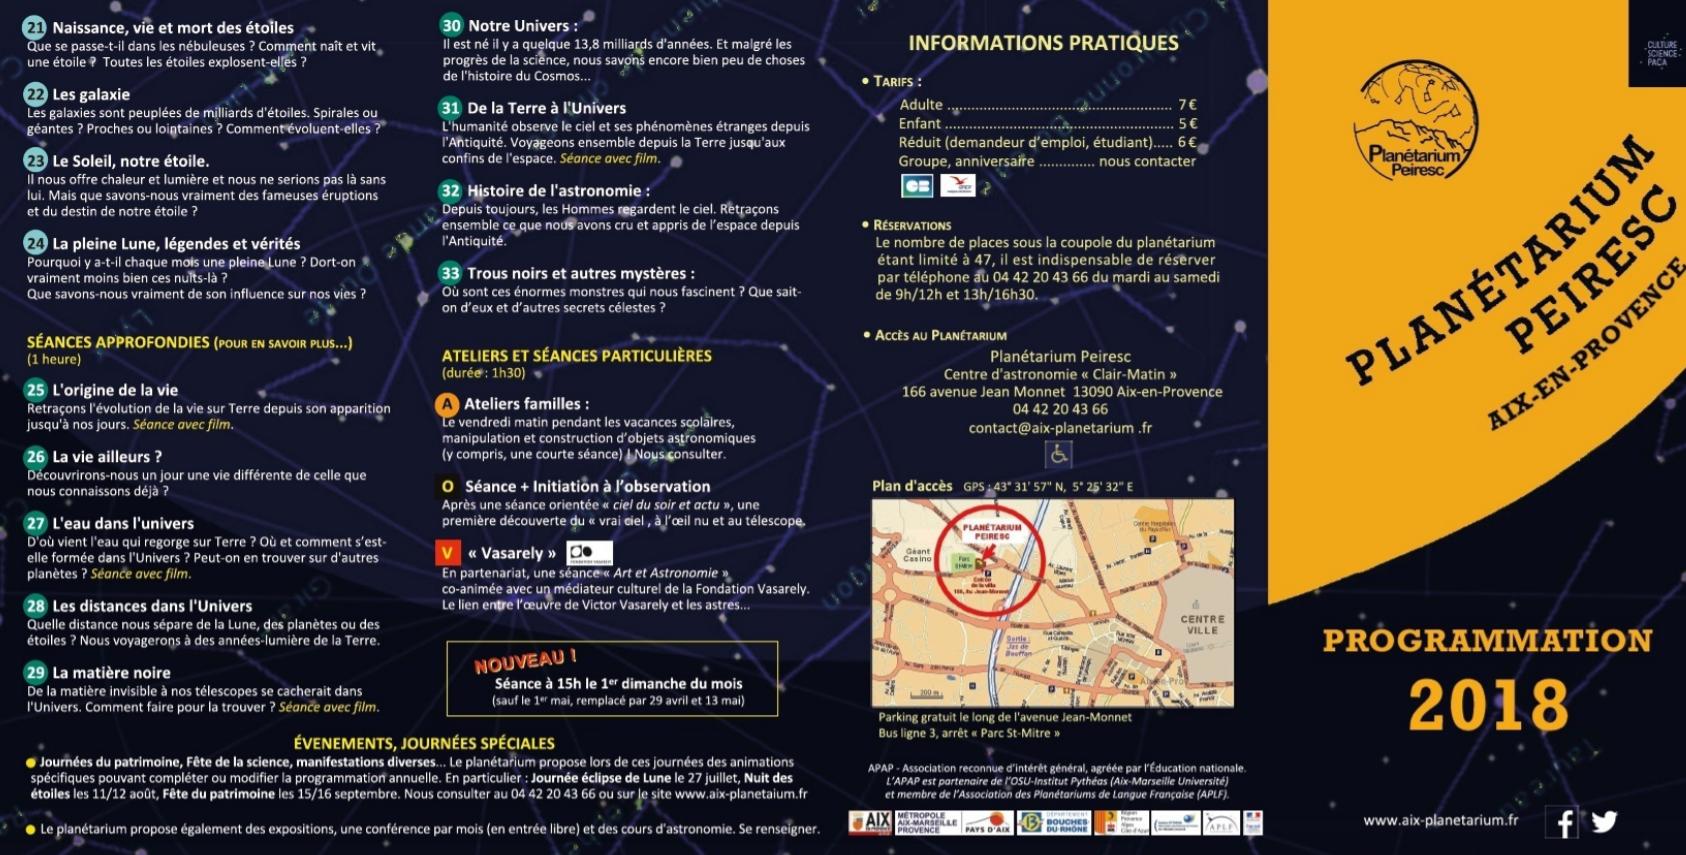 Planetarium Peiresc programmation 2018